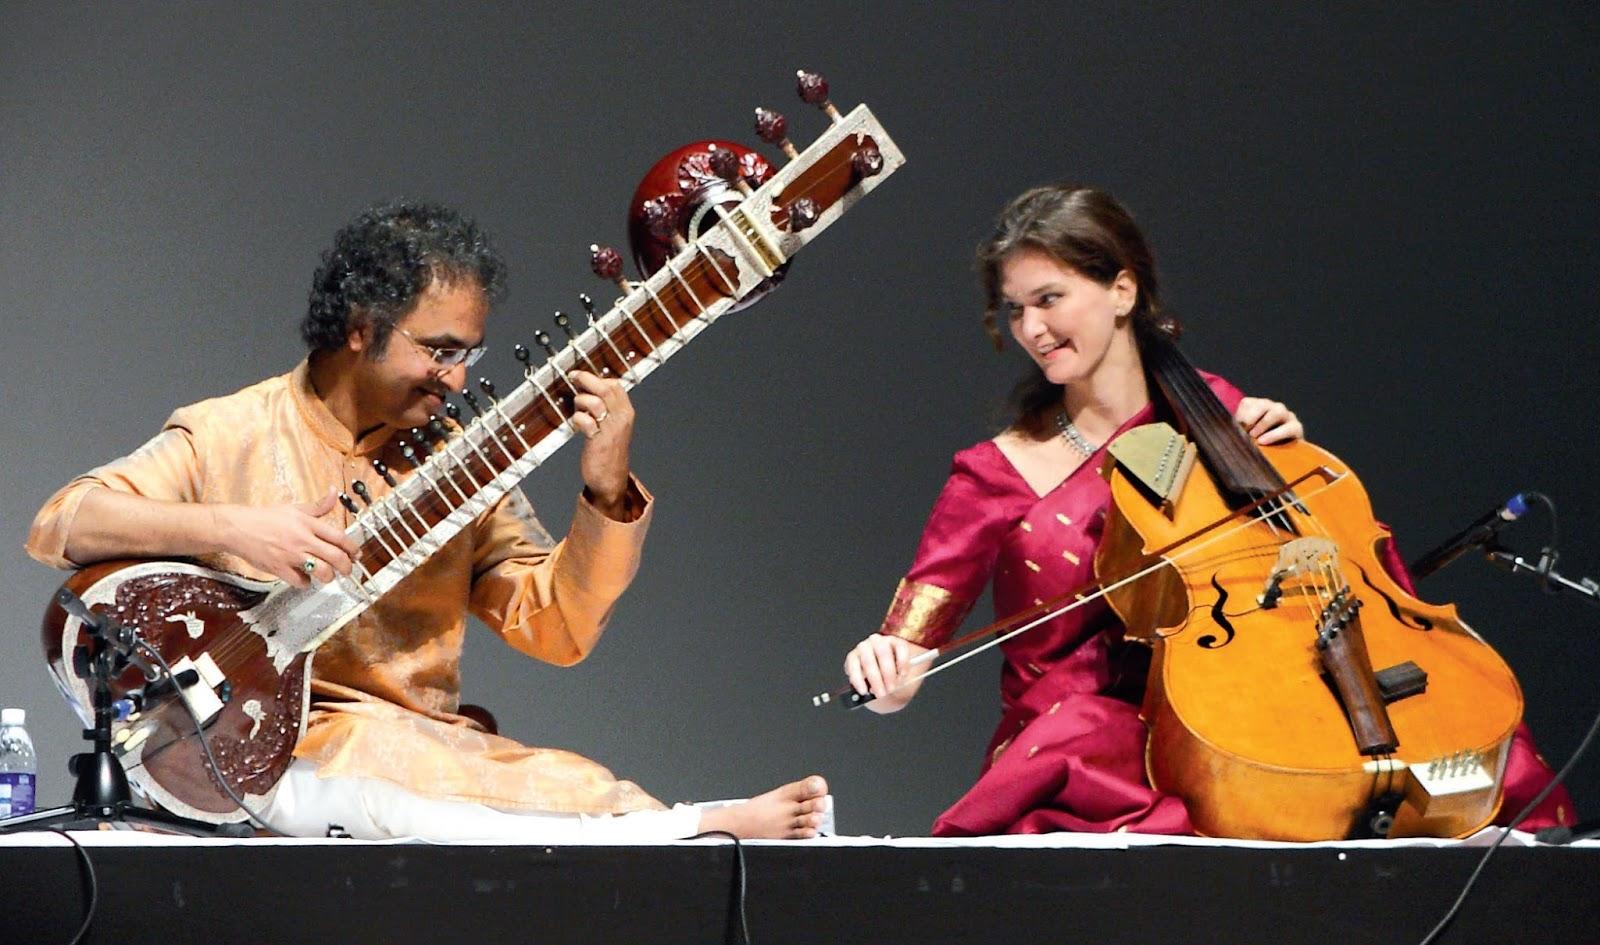 music hindustani cellist classical indian north sruti rao western saskia haas